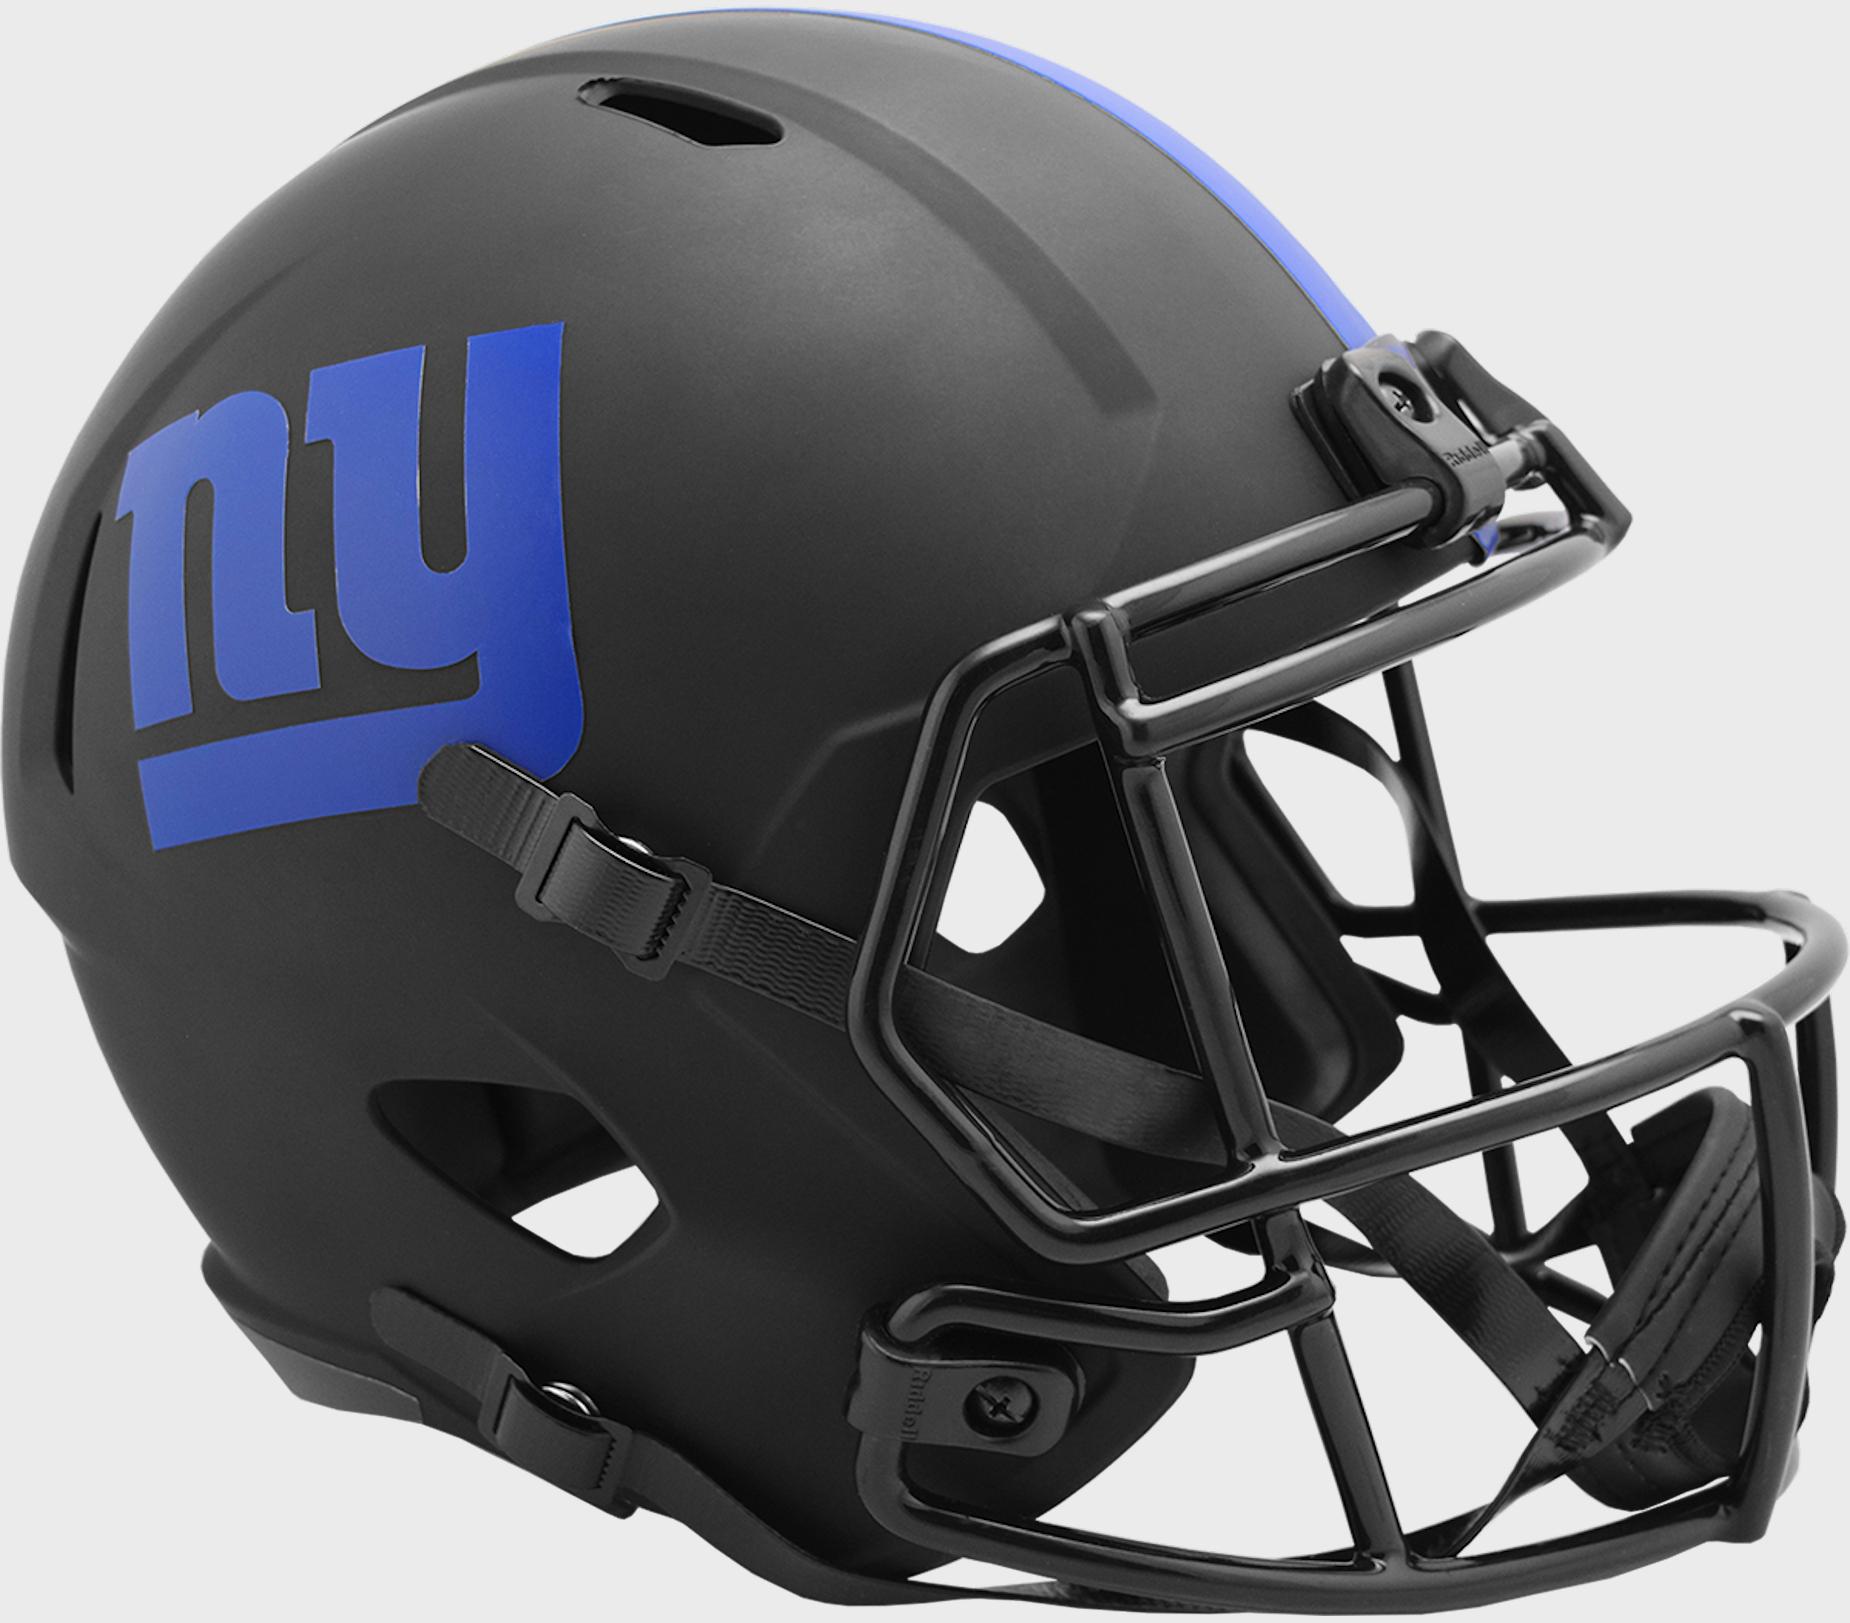 New York Giants Speed Replica Football Helmet <B>ECLIPSE </B>